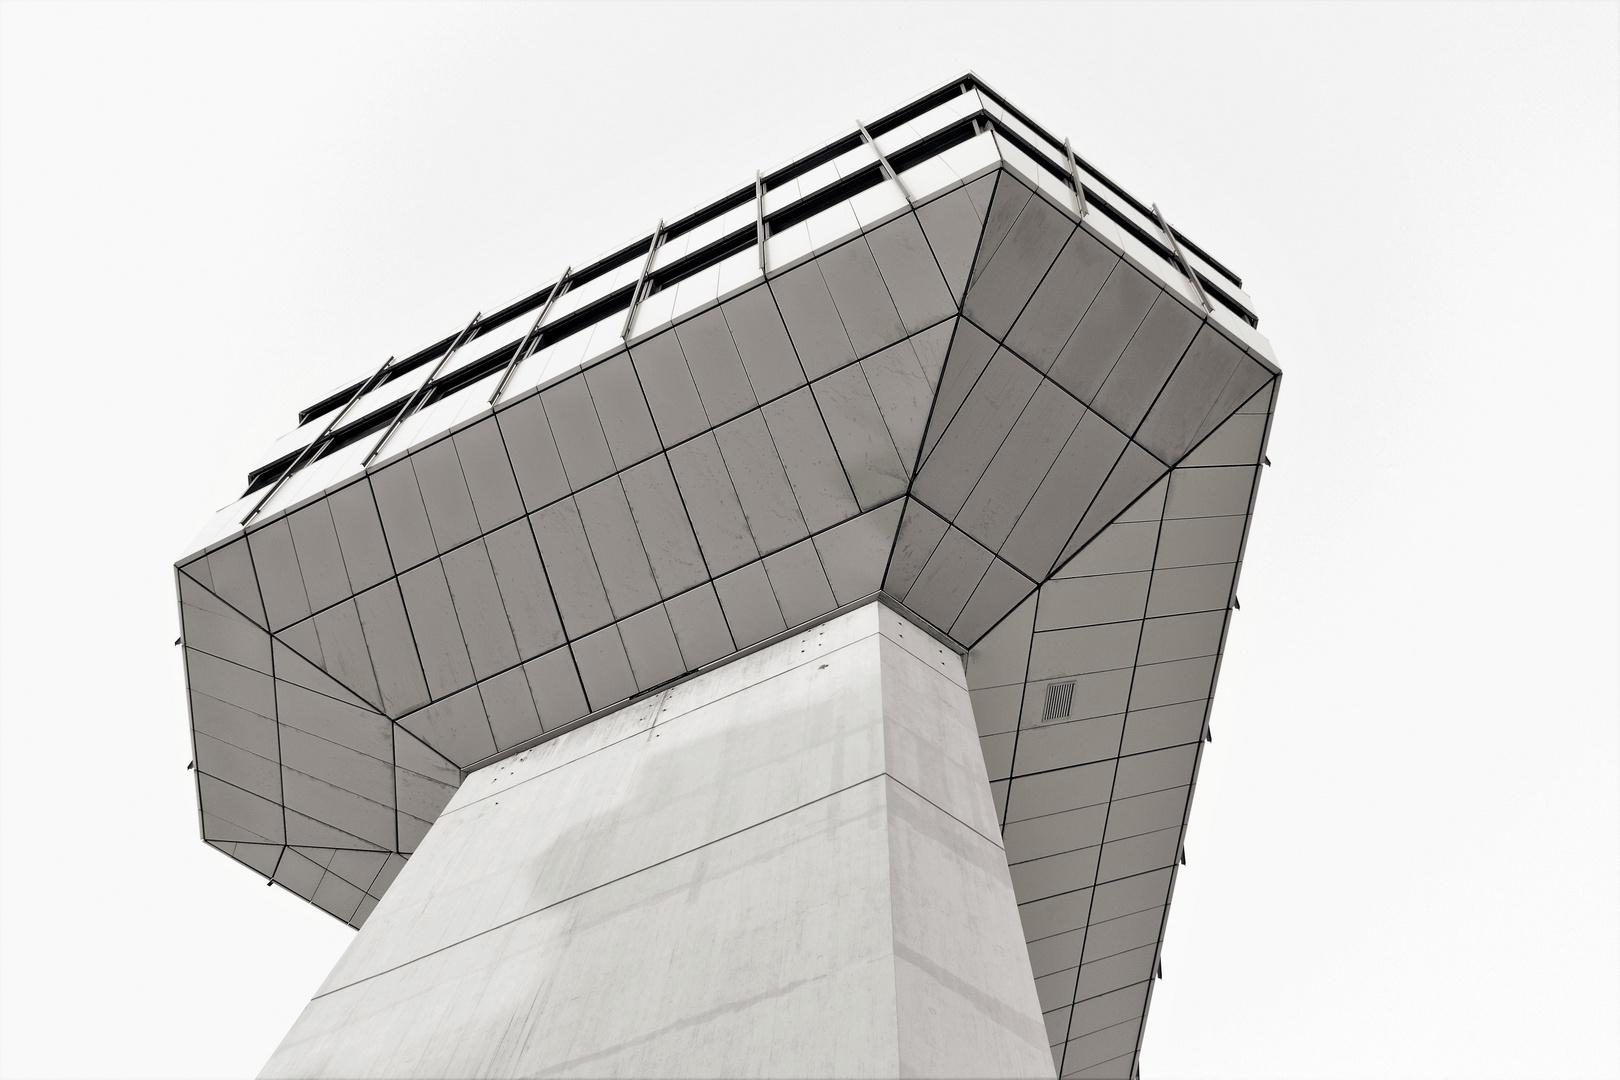 Tegel Tower